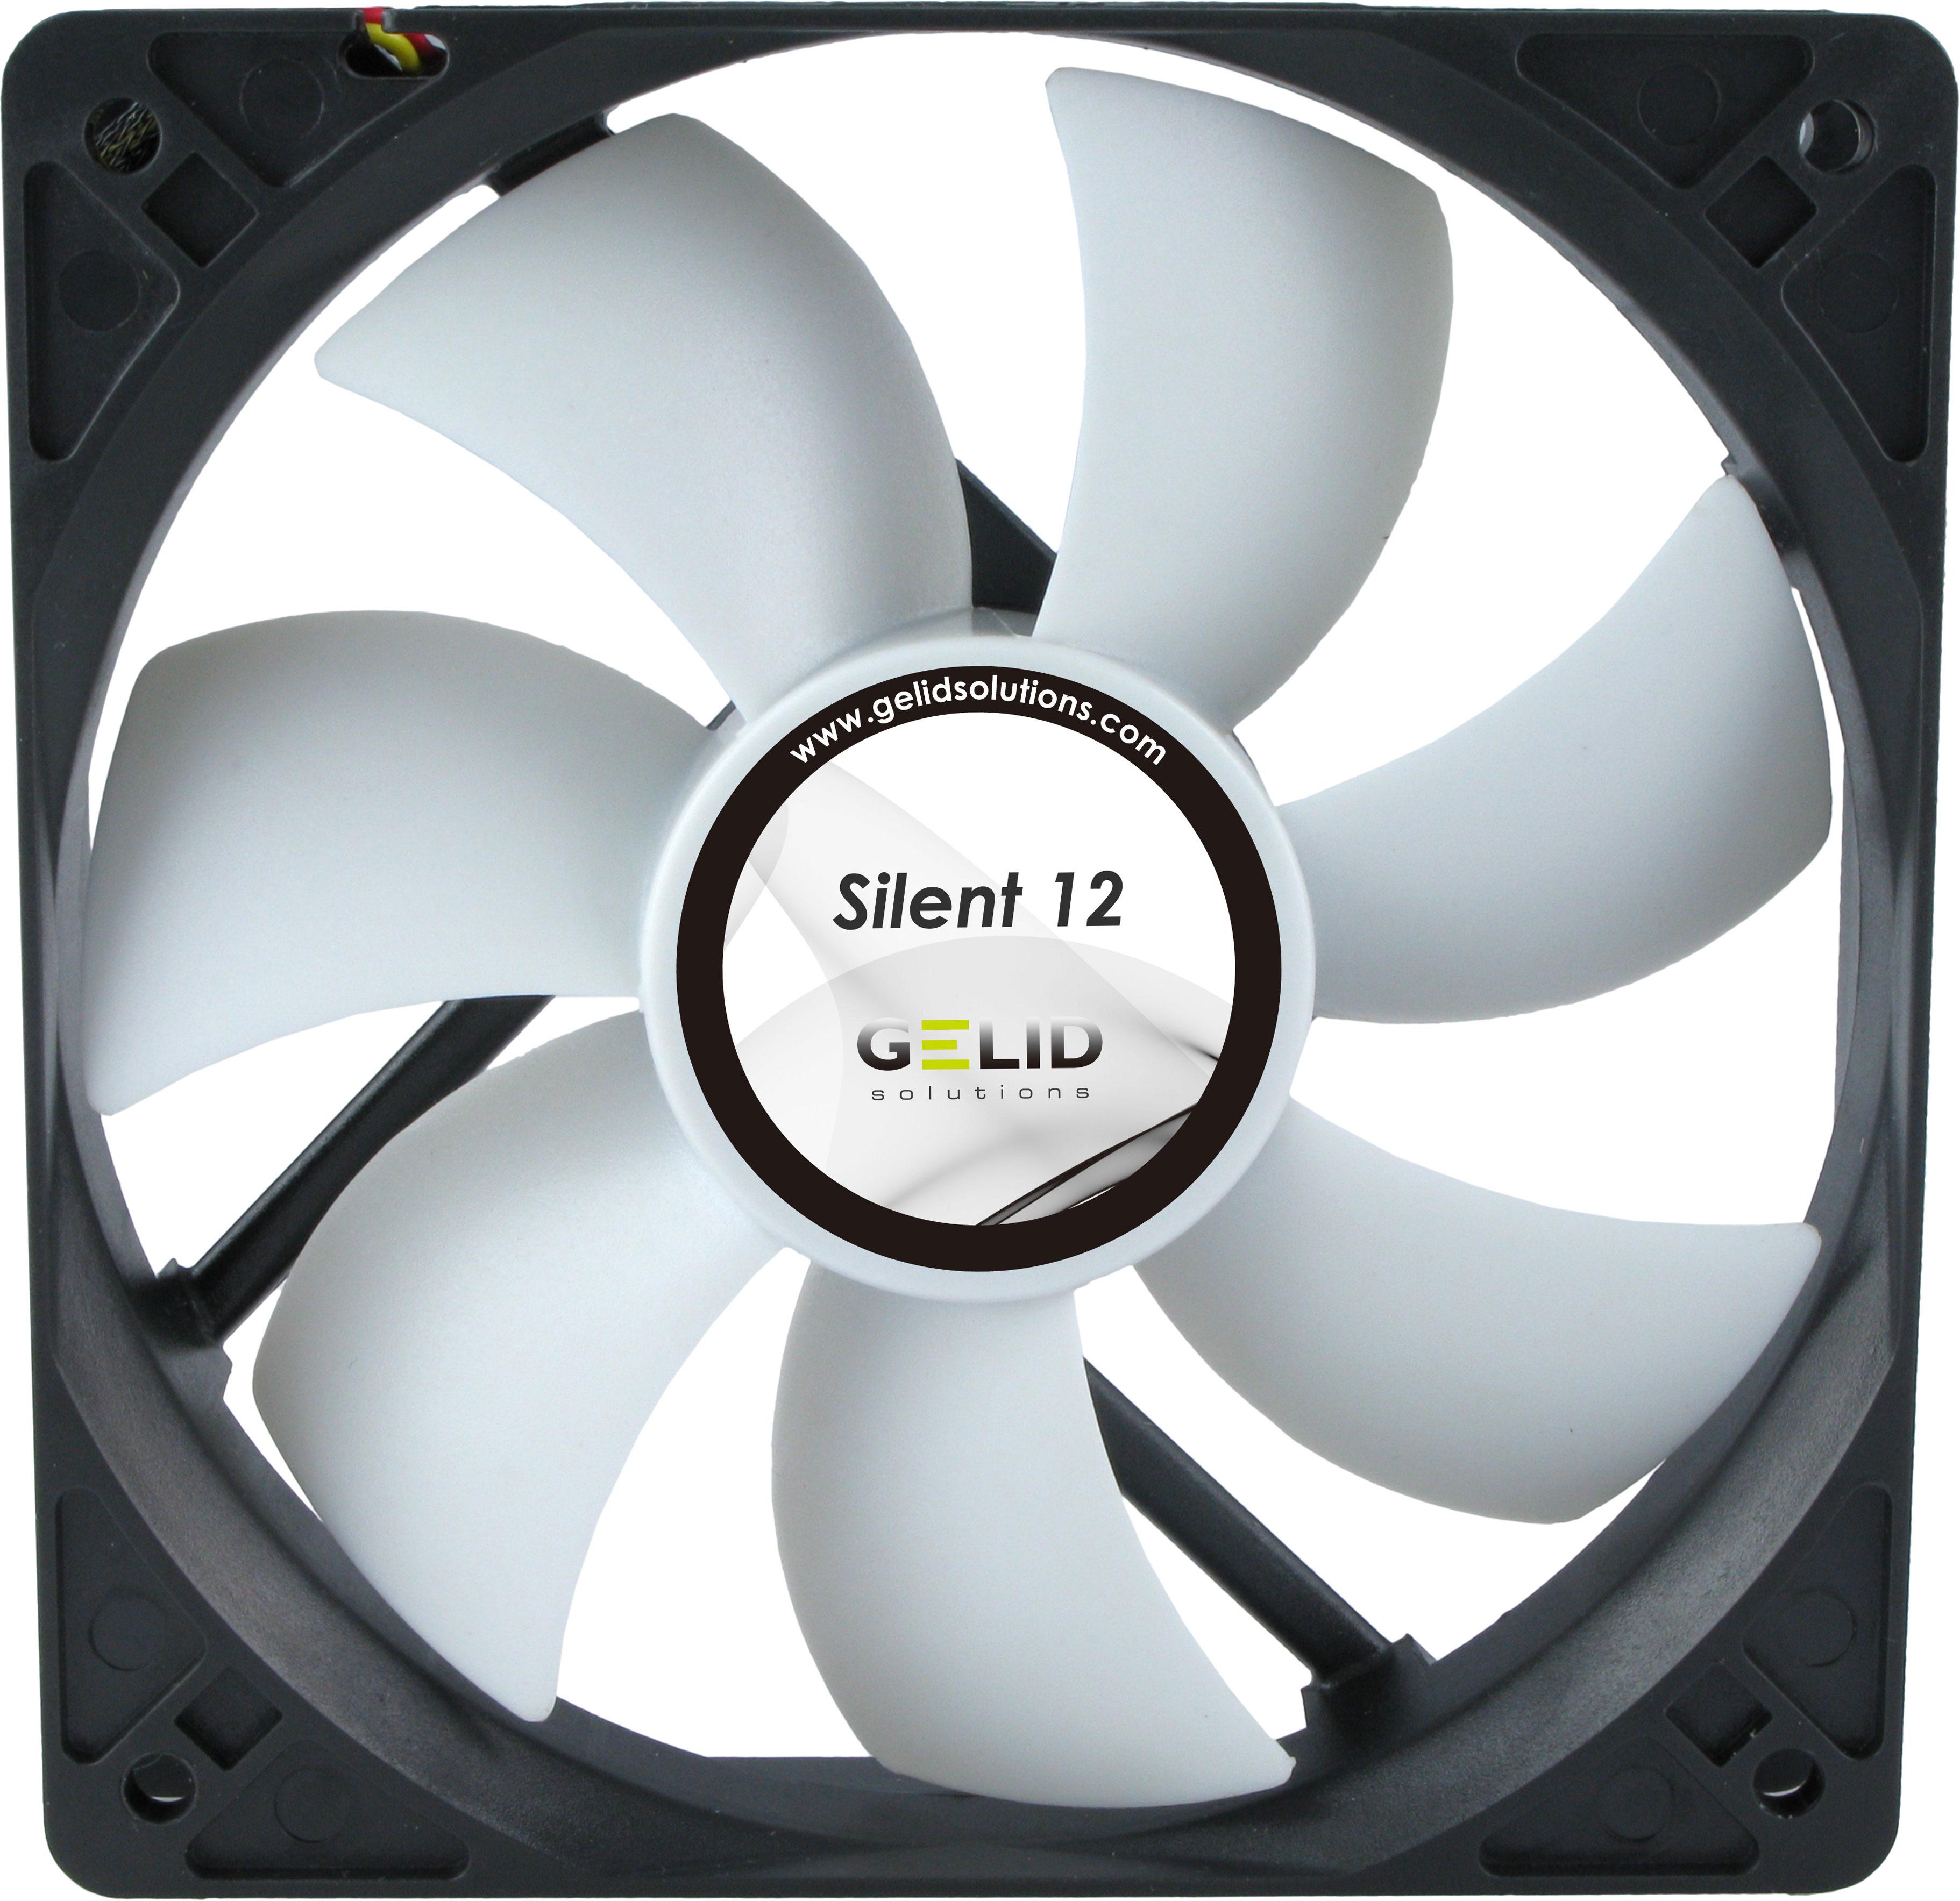 Silent 12 120mm Quiet Case Fan